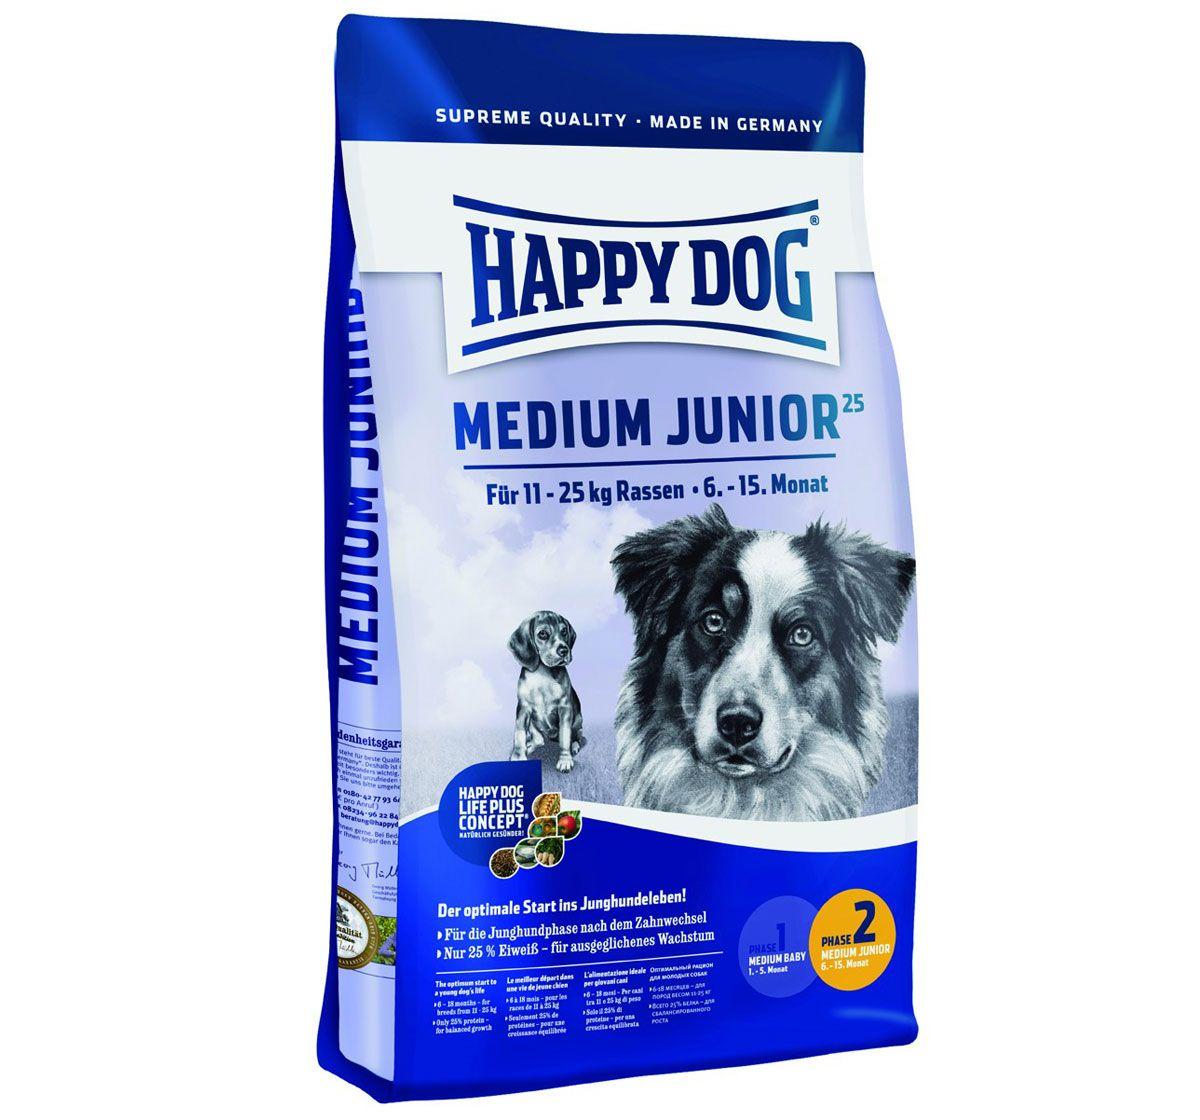 Happy Dog Medium Breed Junior Dog Food 1 Kg Buy Dog Food Online